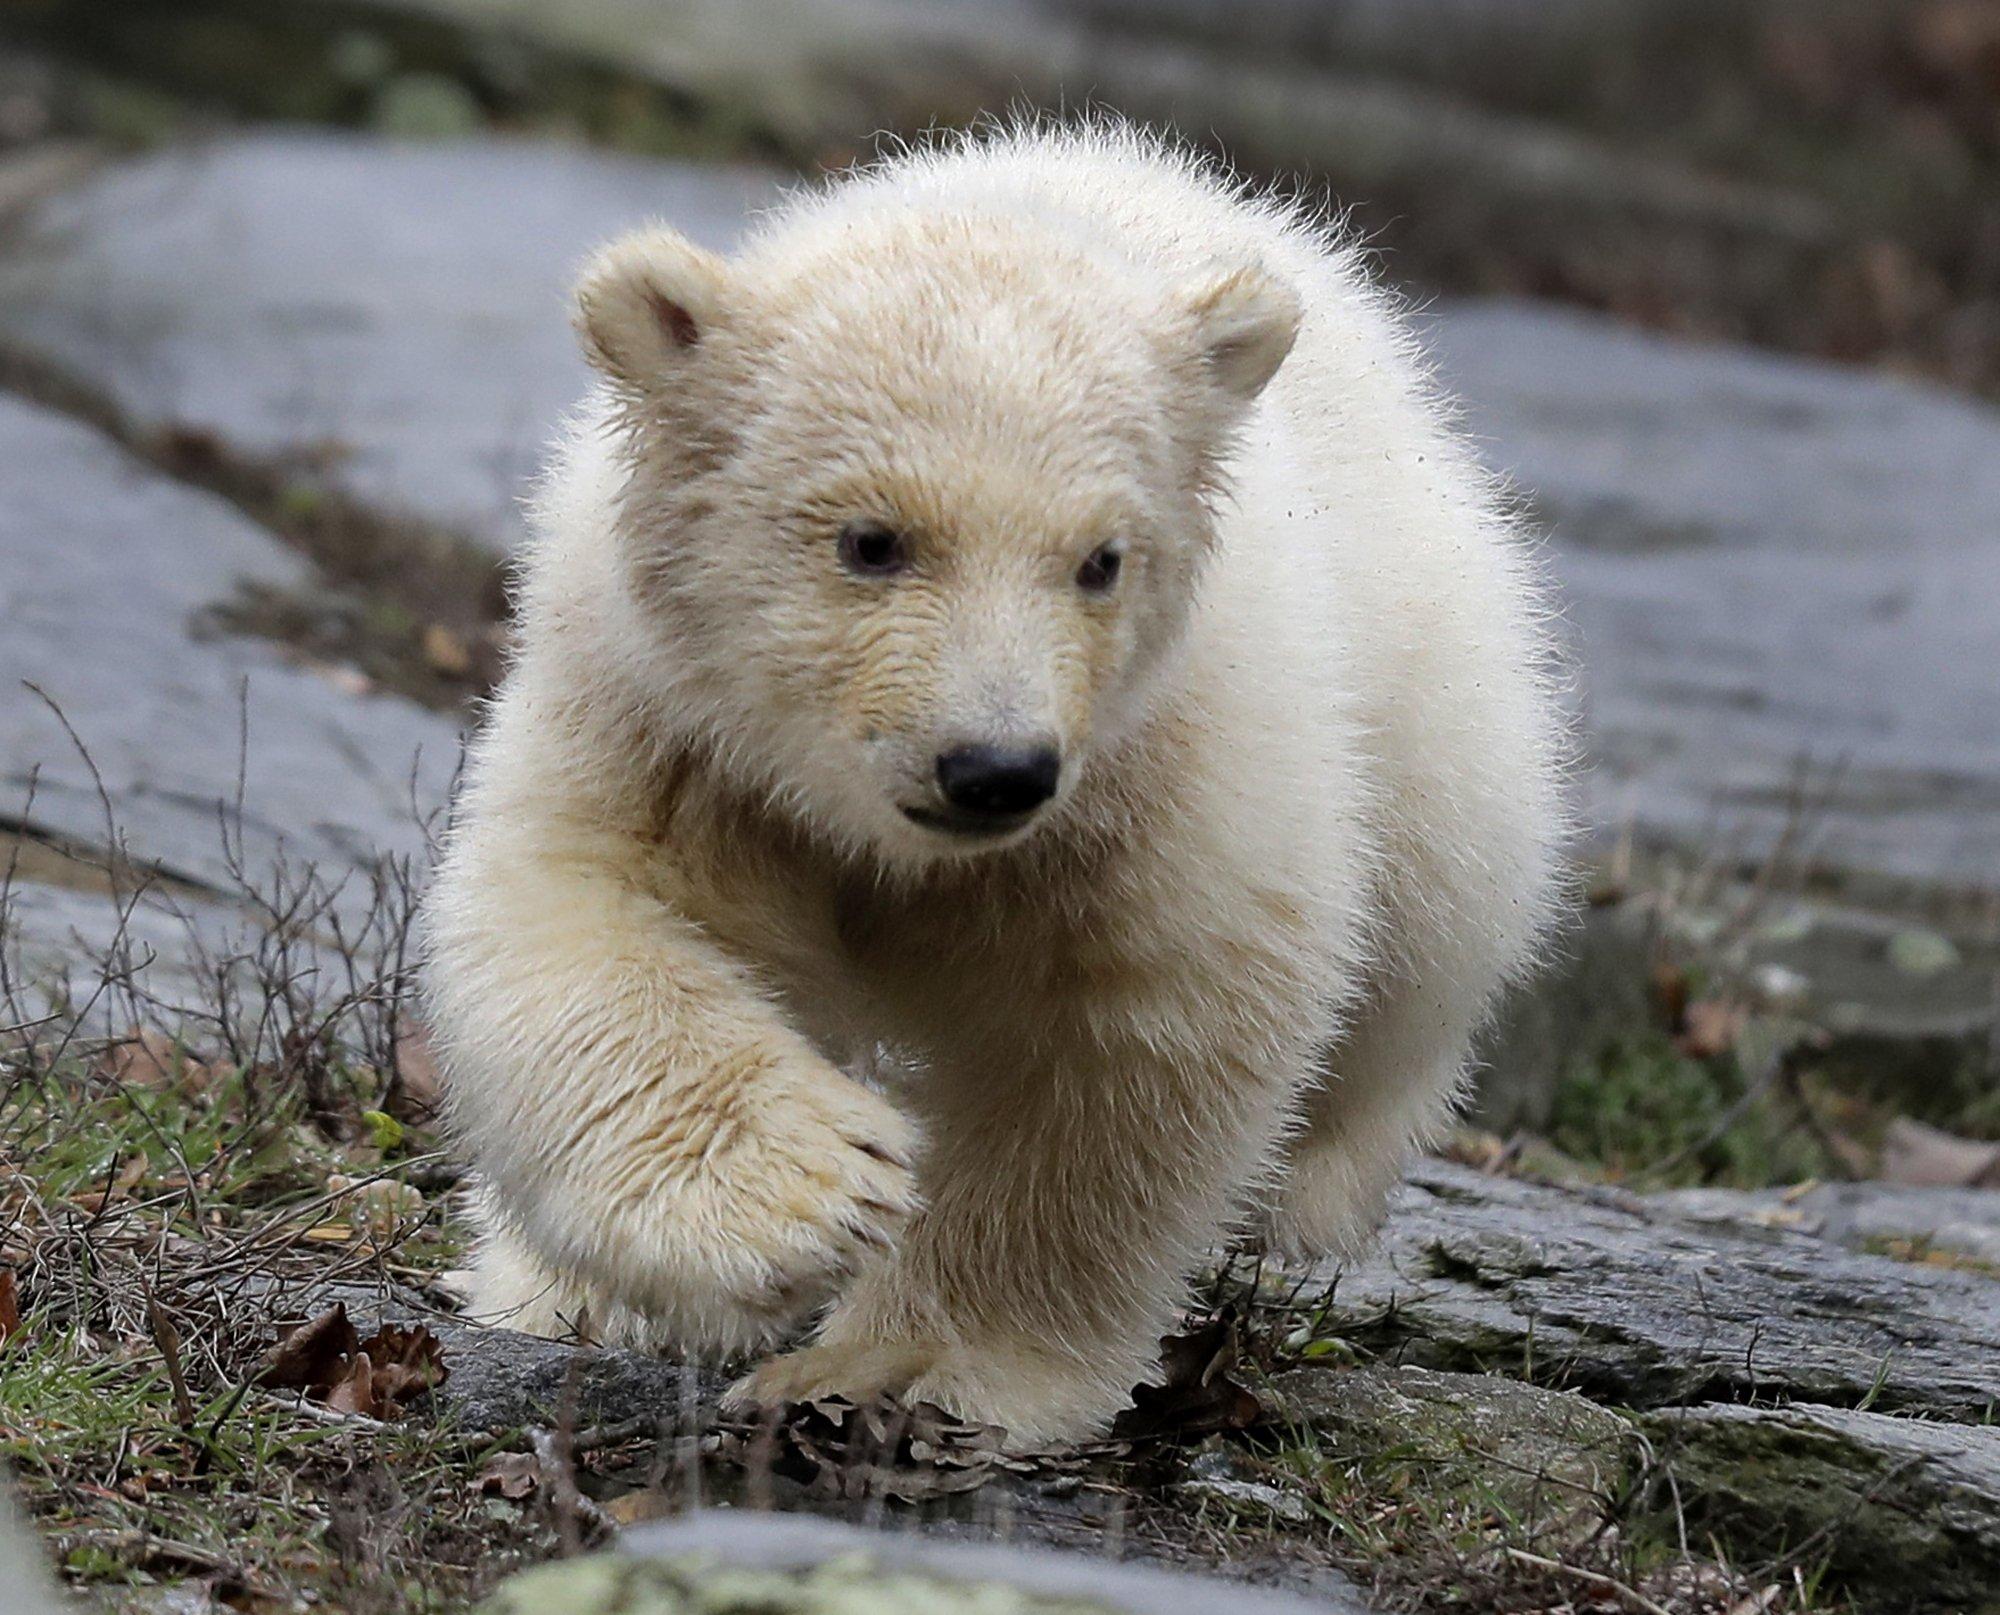 милиционер красивое фото медвежонка поможет